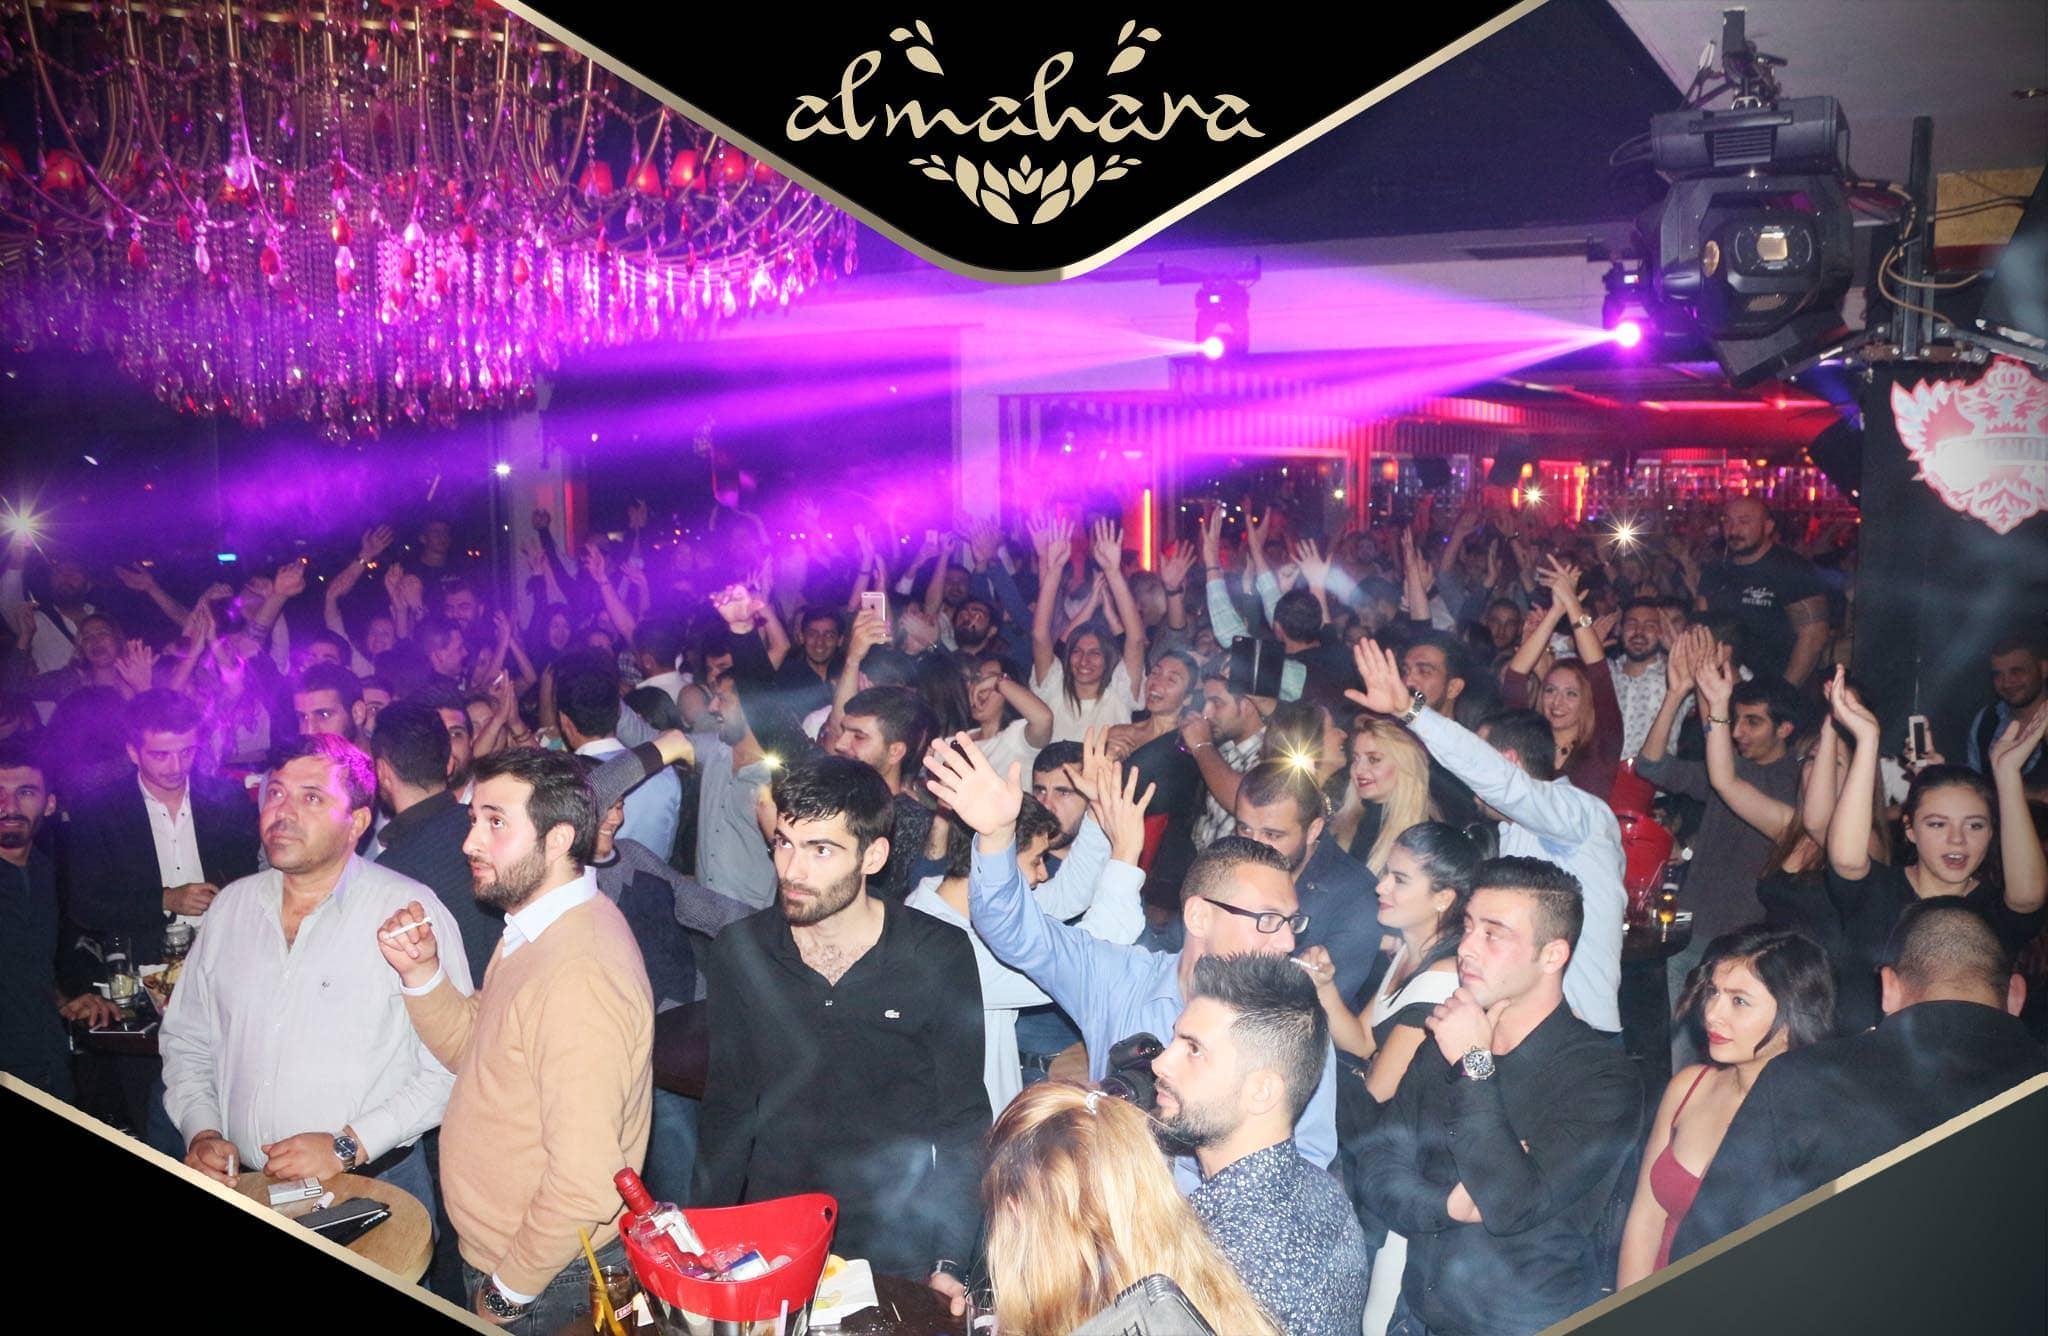 almahara club